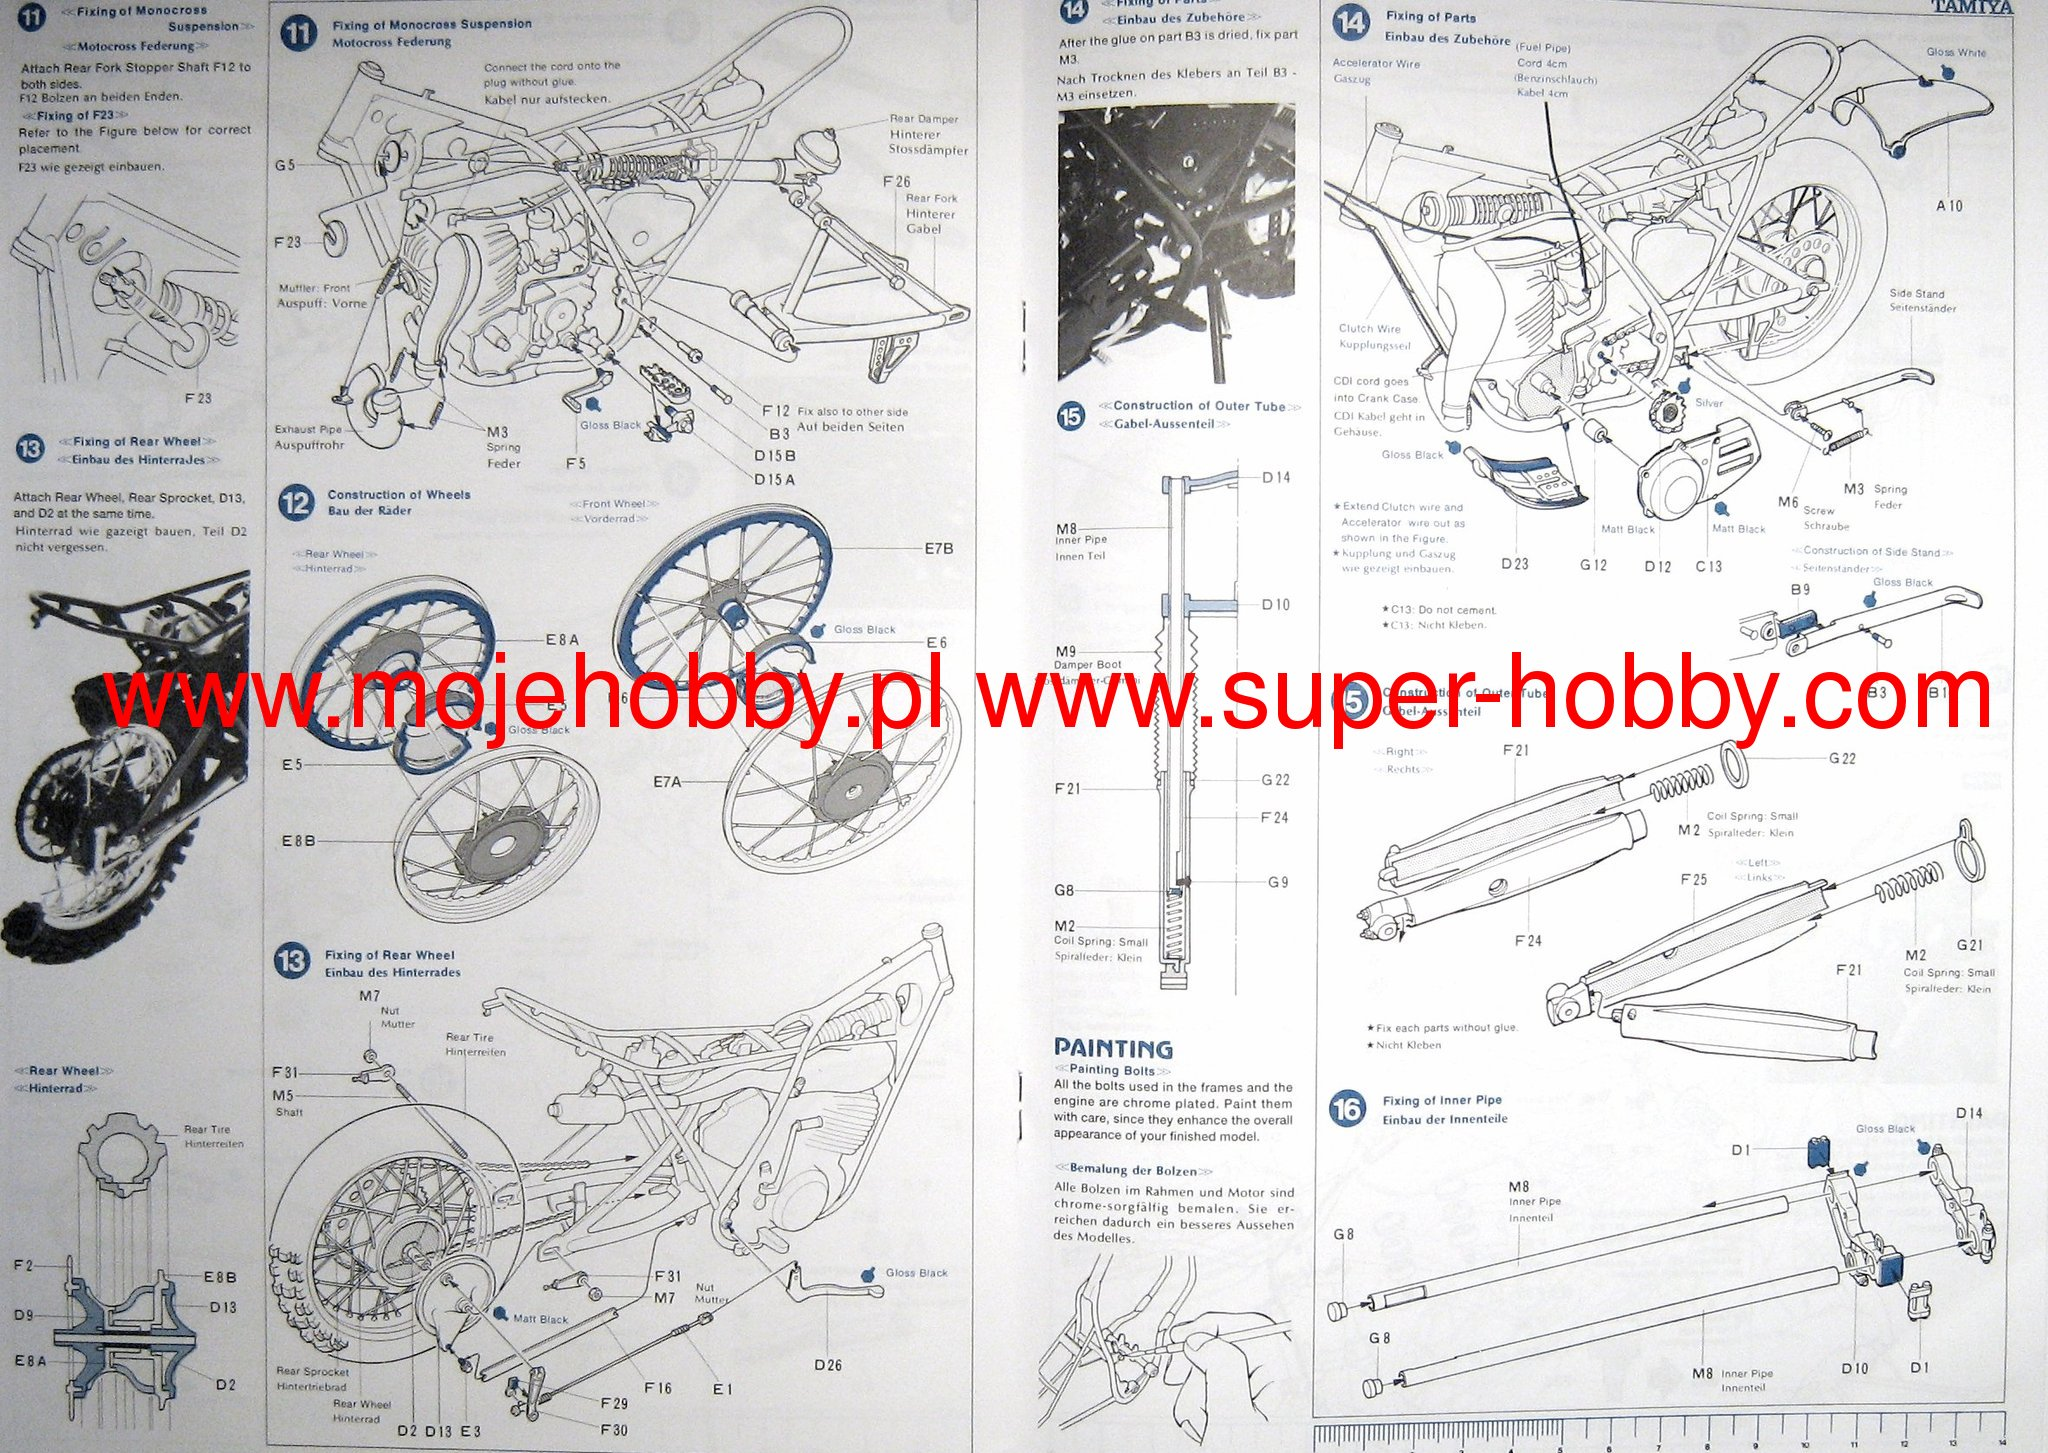 Yamaha Motocrosser Yz250 Tamiya 16036 Wiring Diagram 2 Tam16036 4